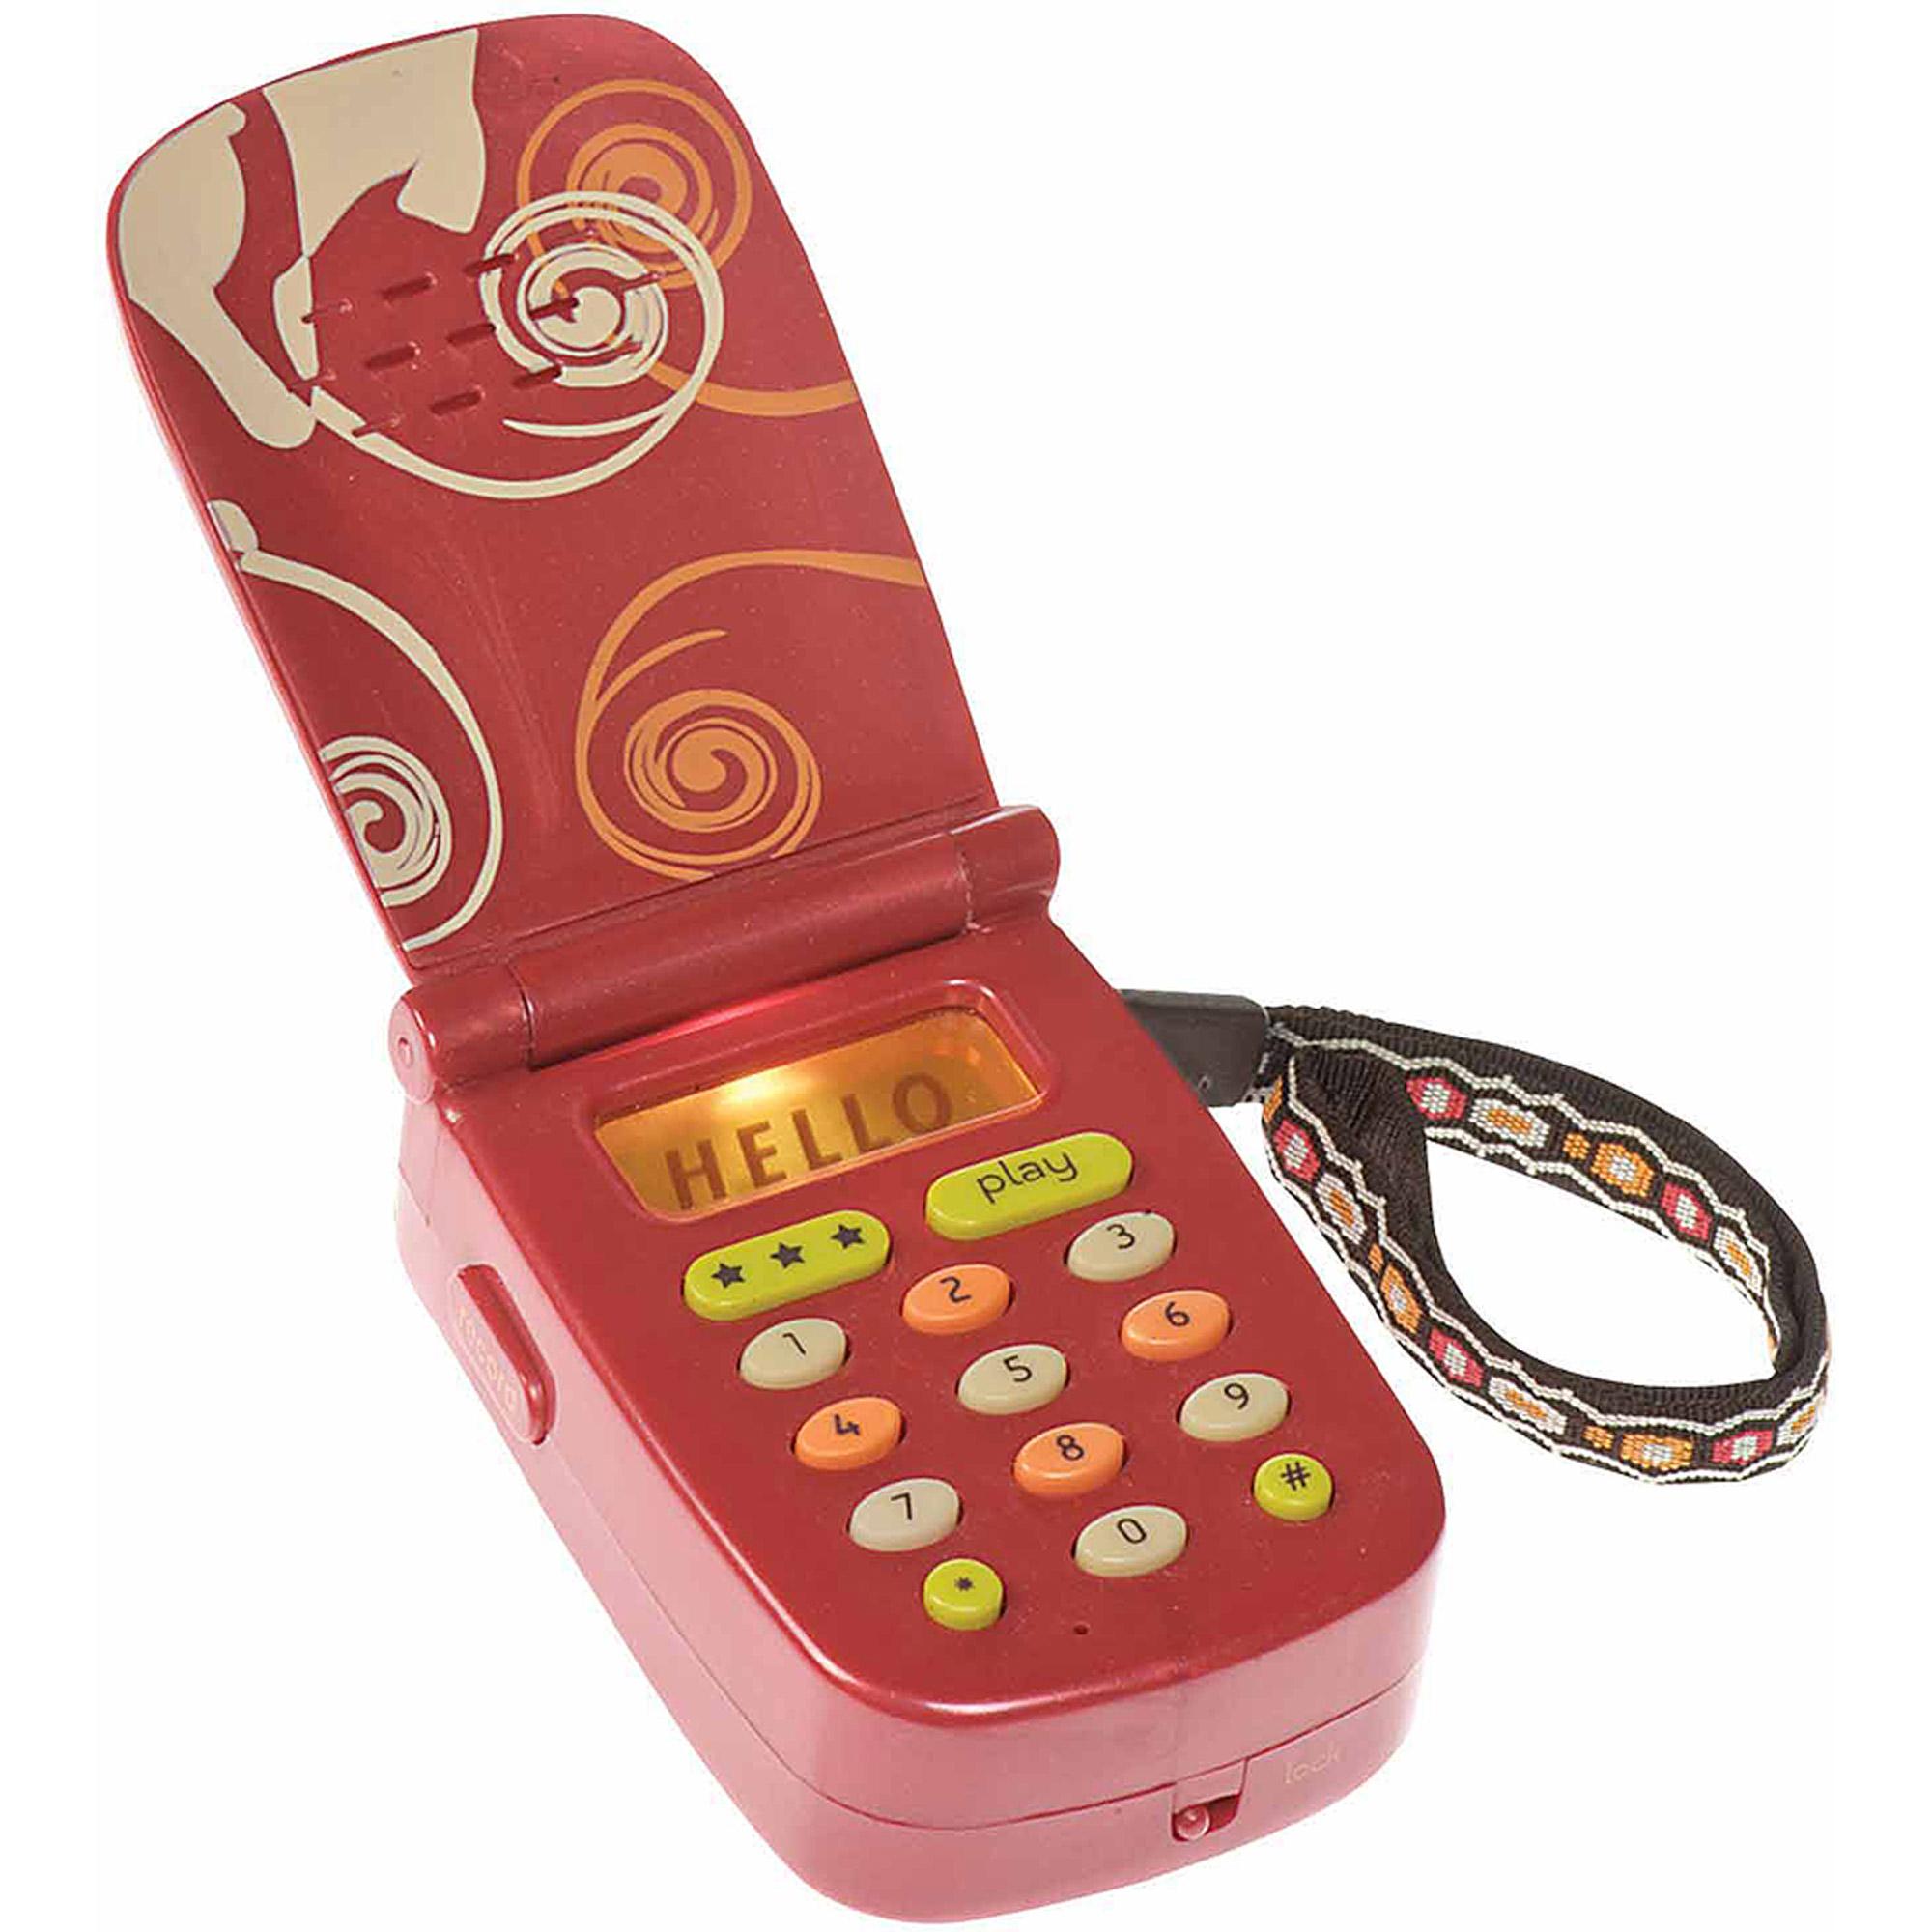 Battat B. Hellophone